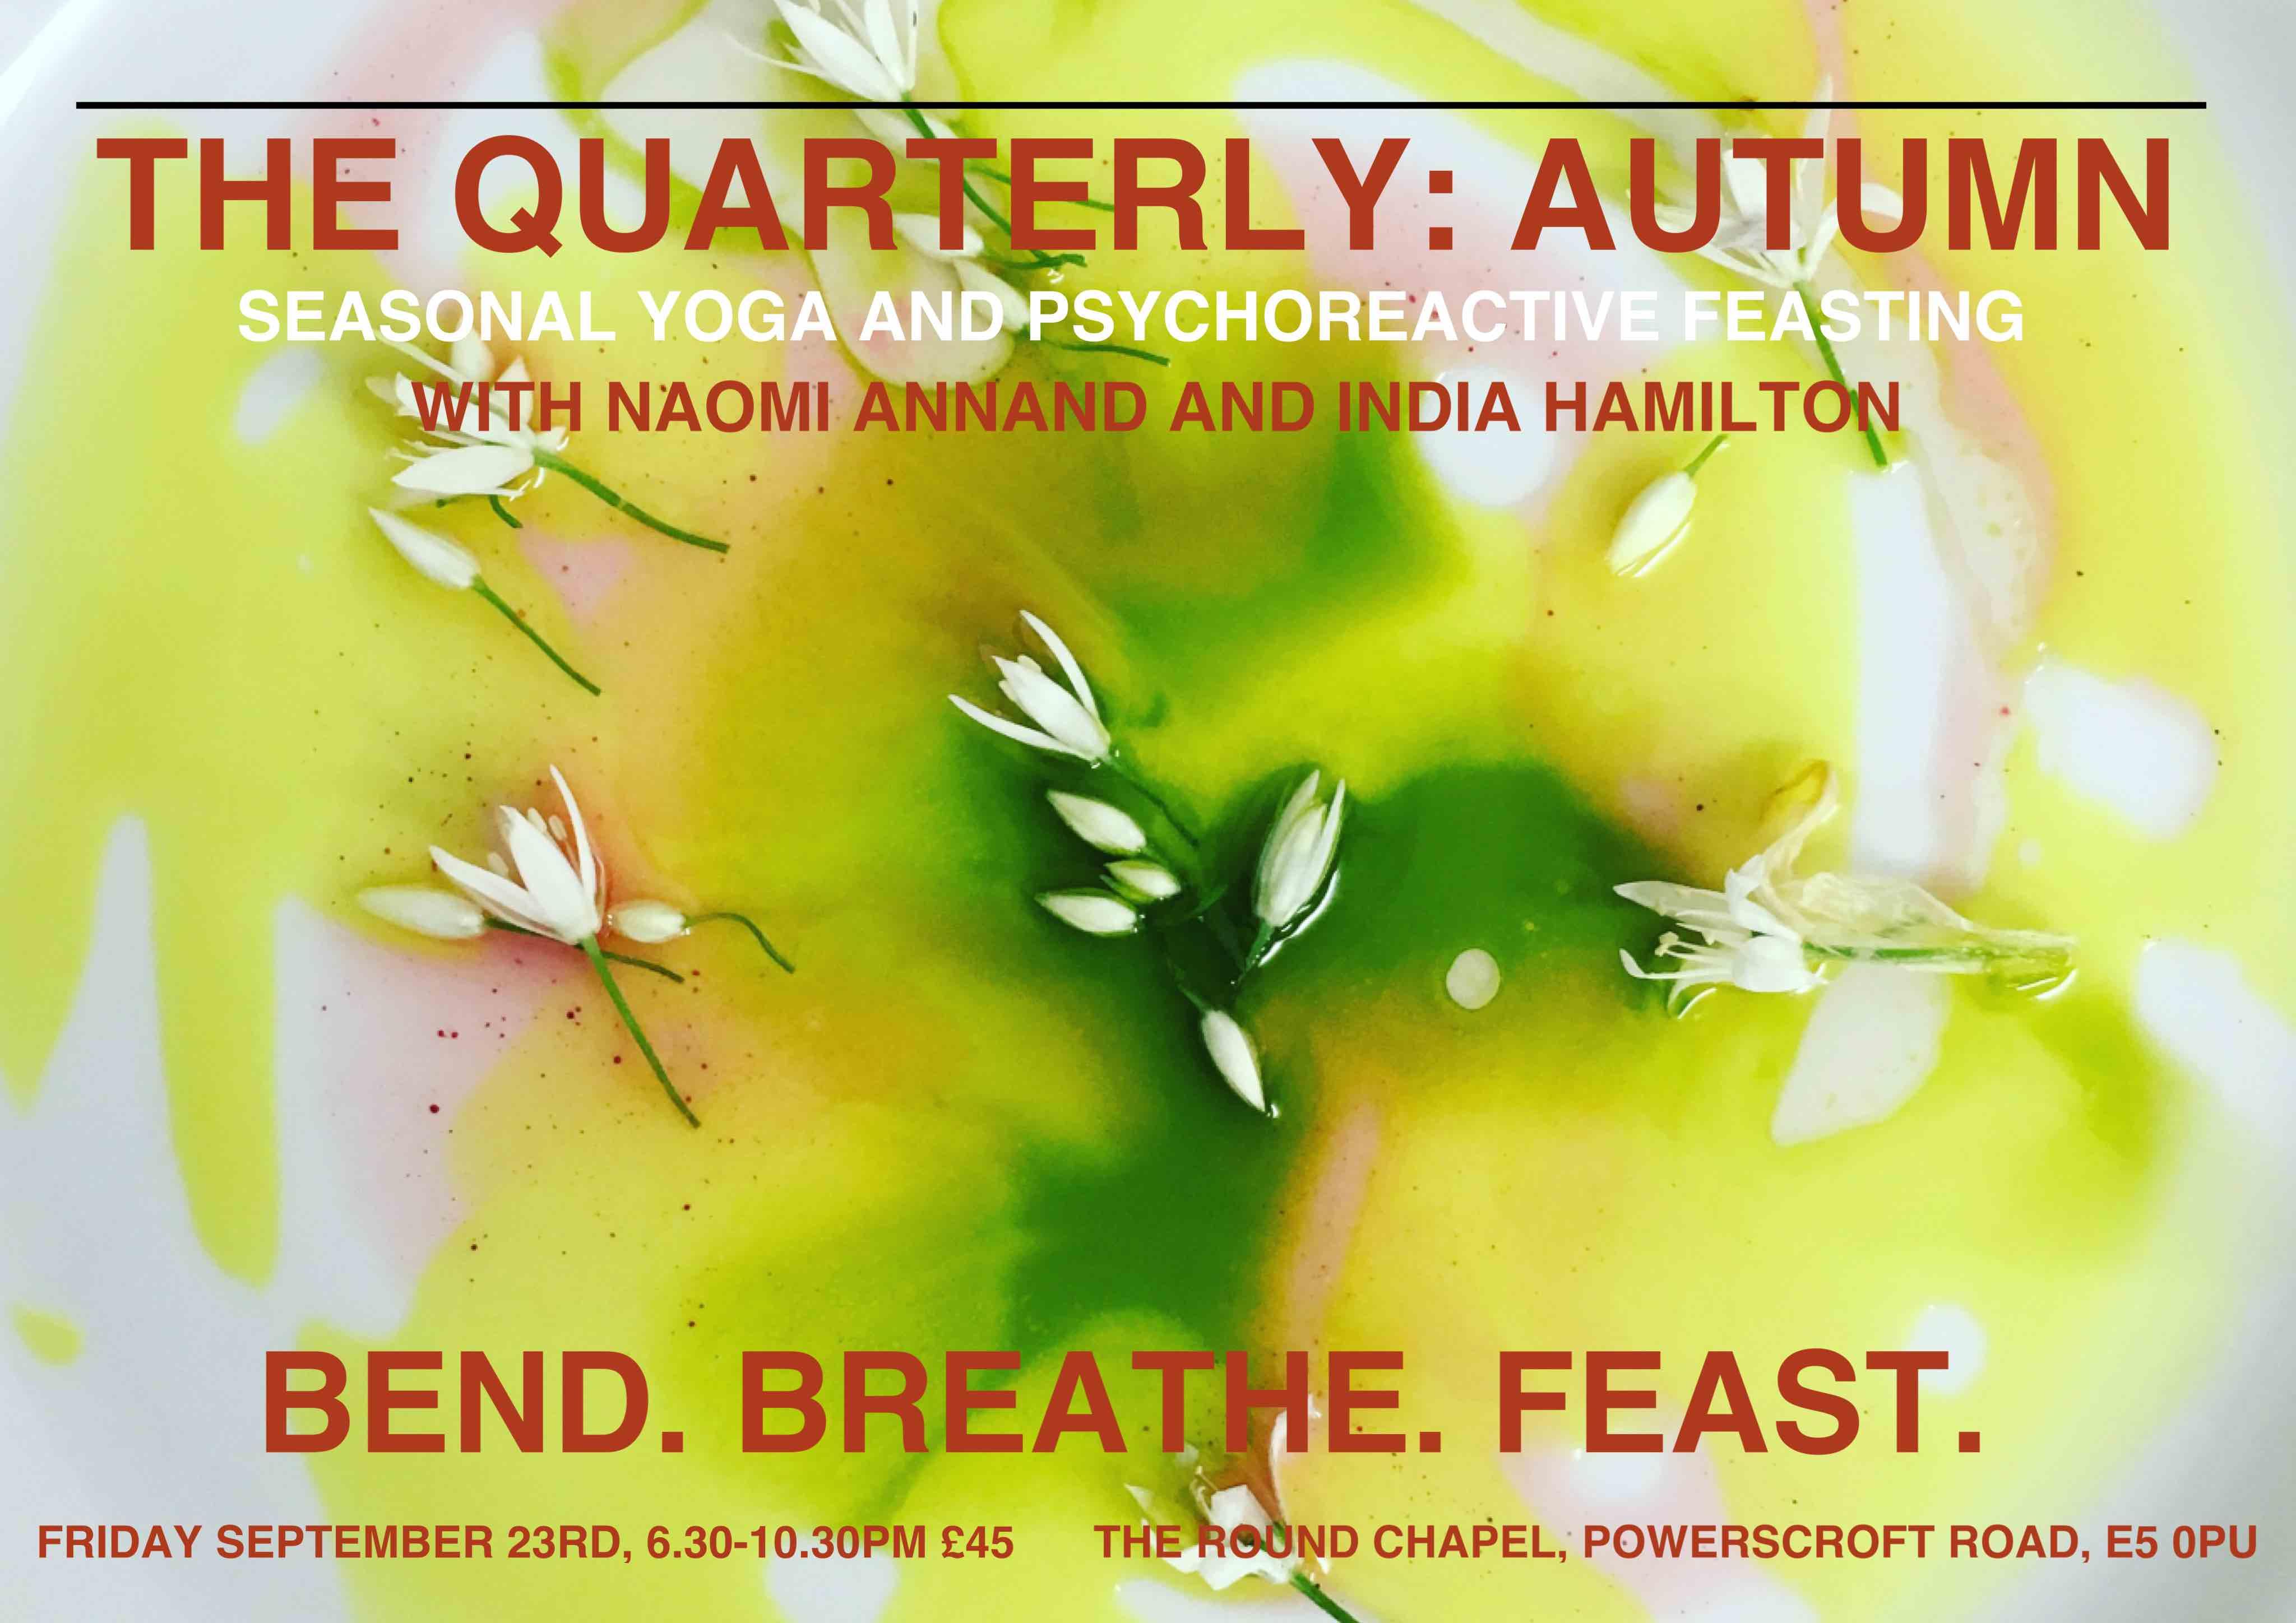 yoga-east-london-workshop-the-quarterly-autumn